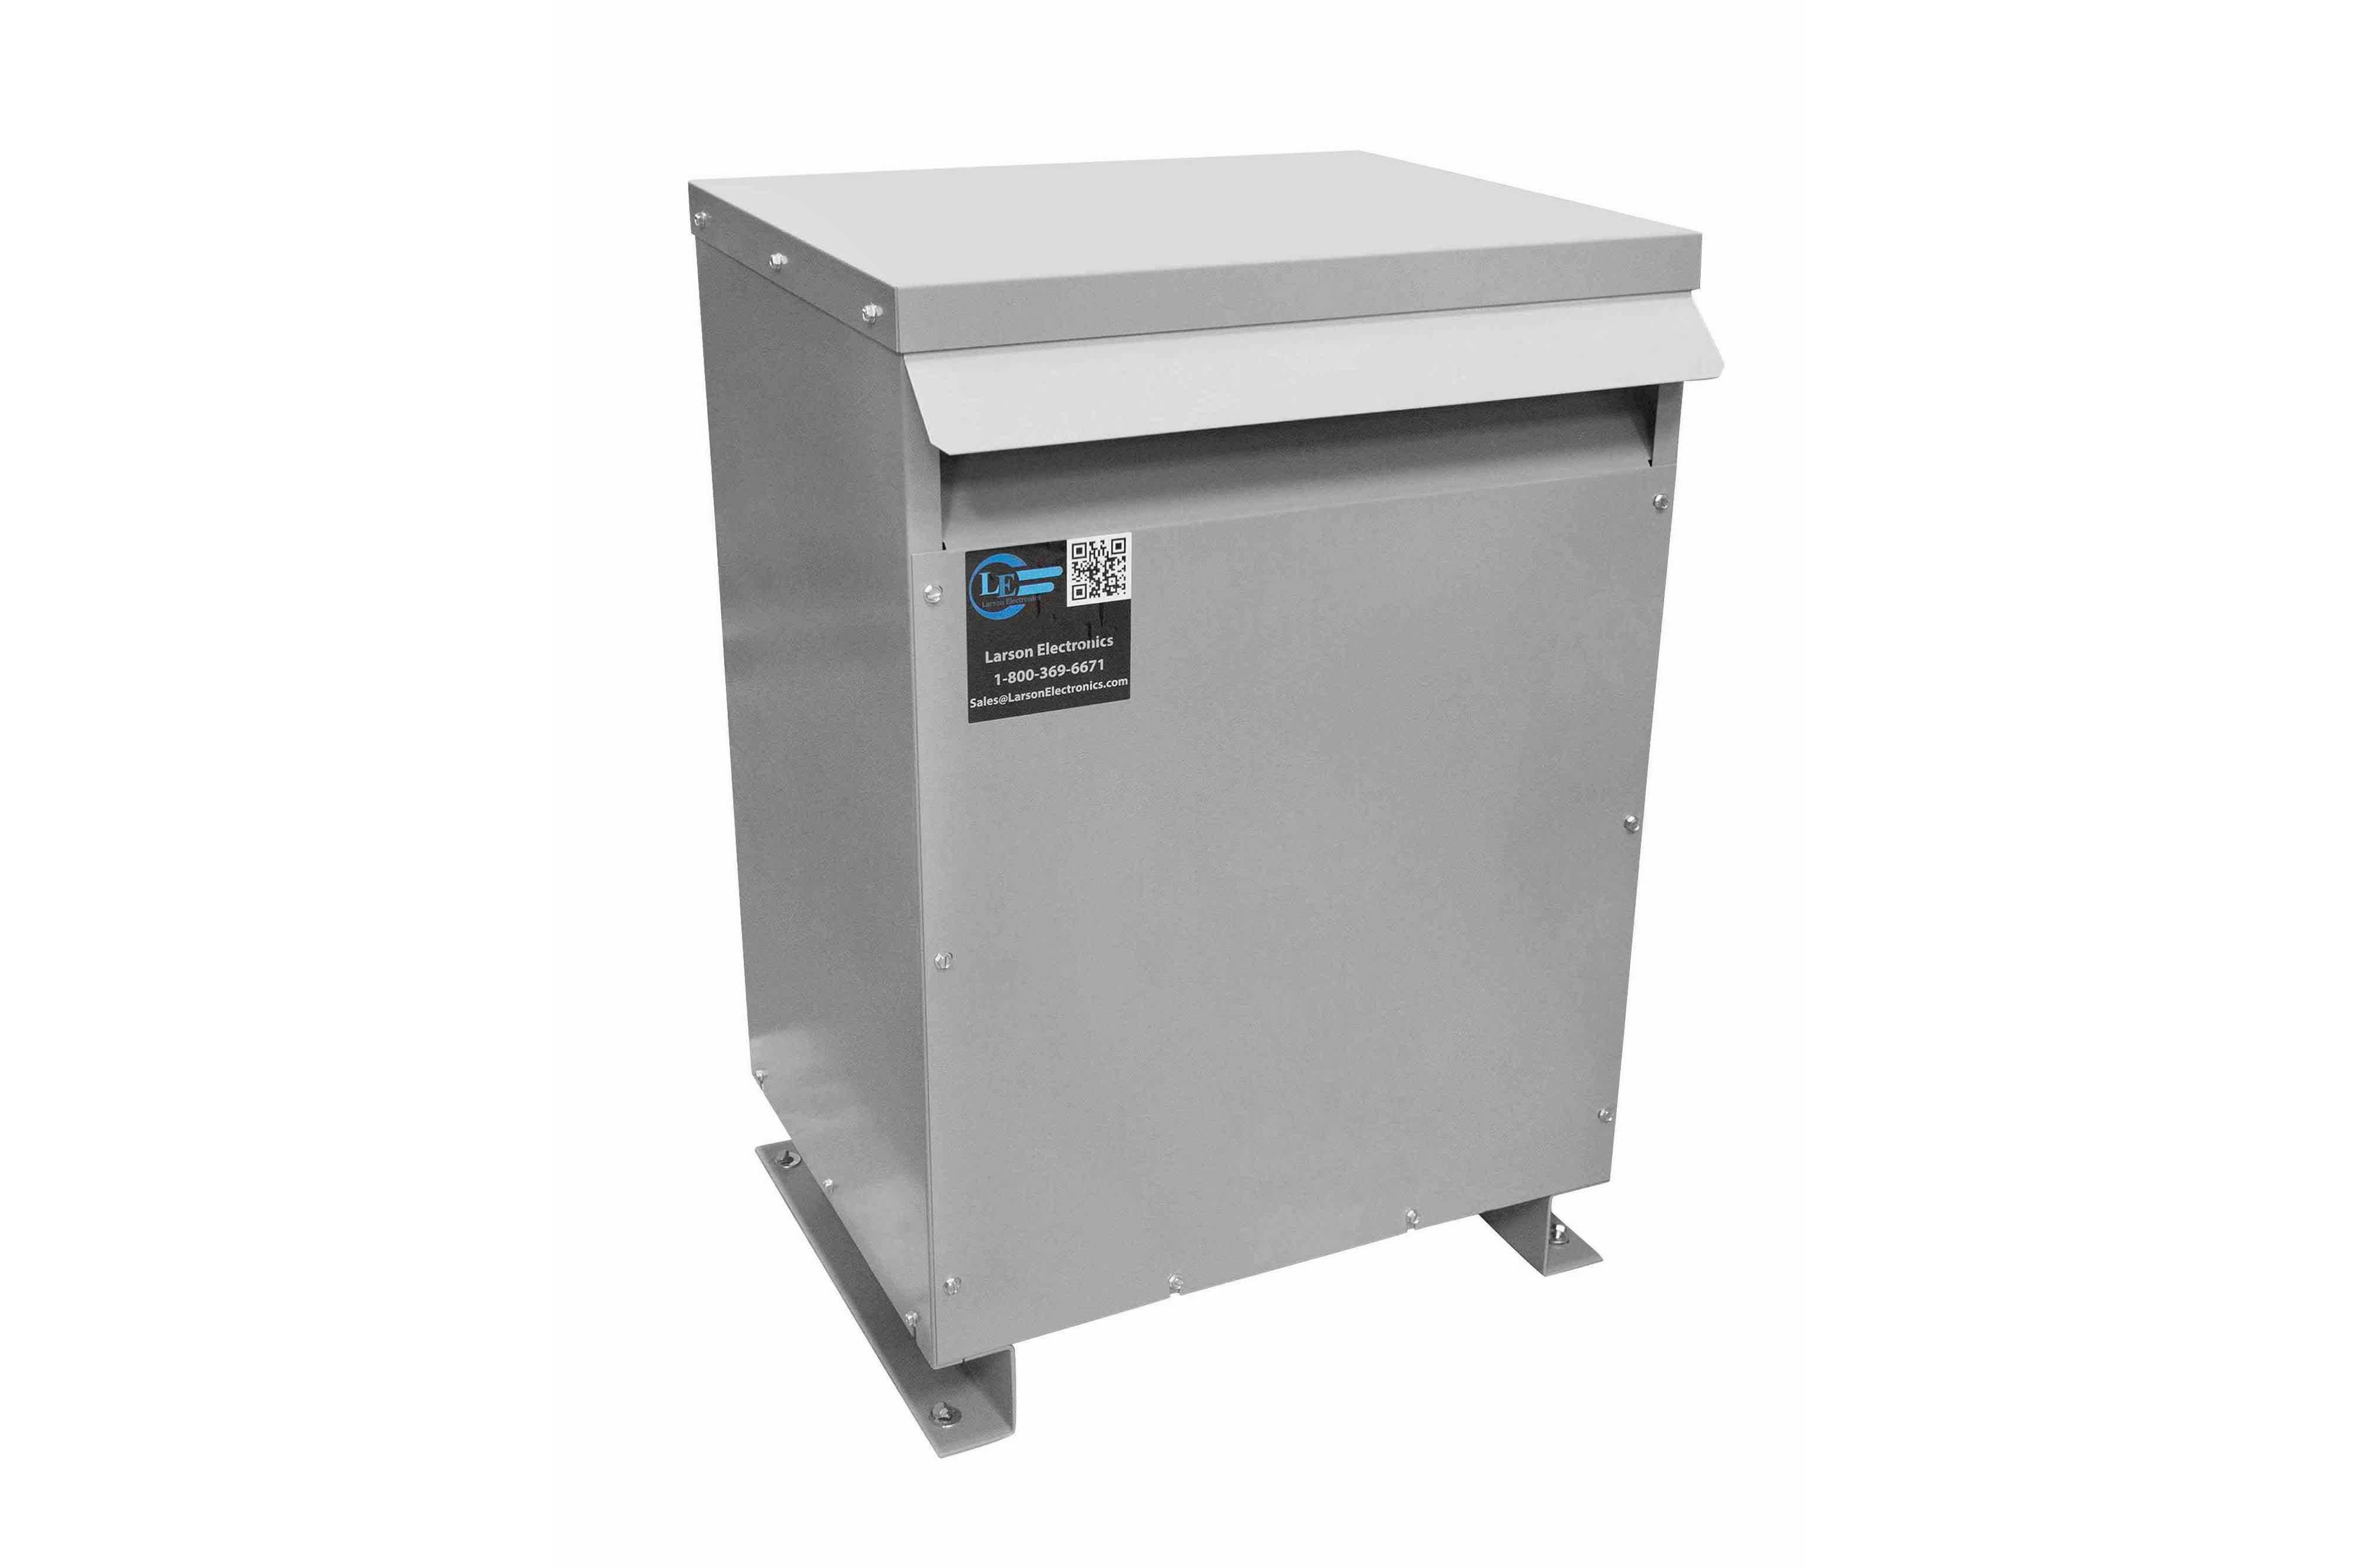 45 kVA 3PH Isolation Transformer, 208V Wye Primary, 208V Delta Secondary, N3R, Ventilated, 60 Hz